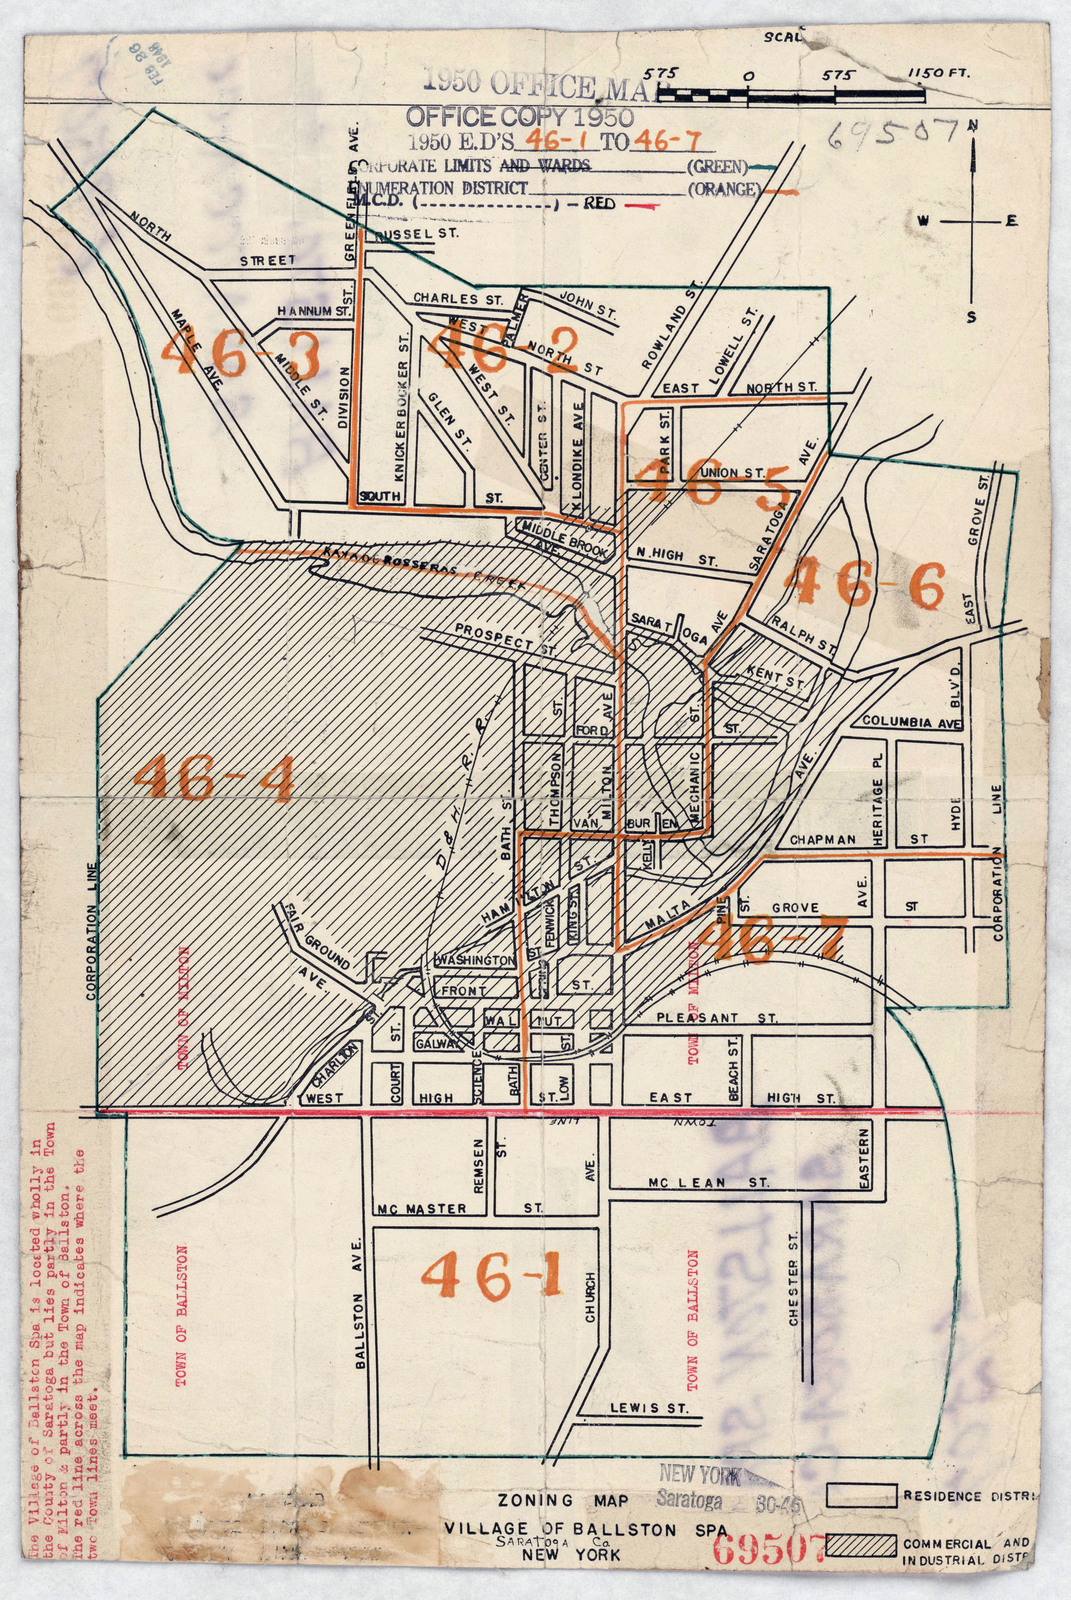 Saratoga New York Map.1950 Census Enumeration District Maps New York Ny Saratoga